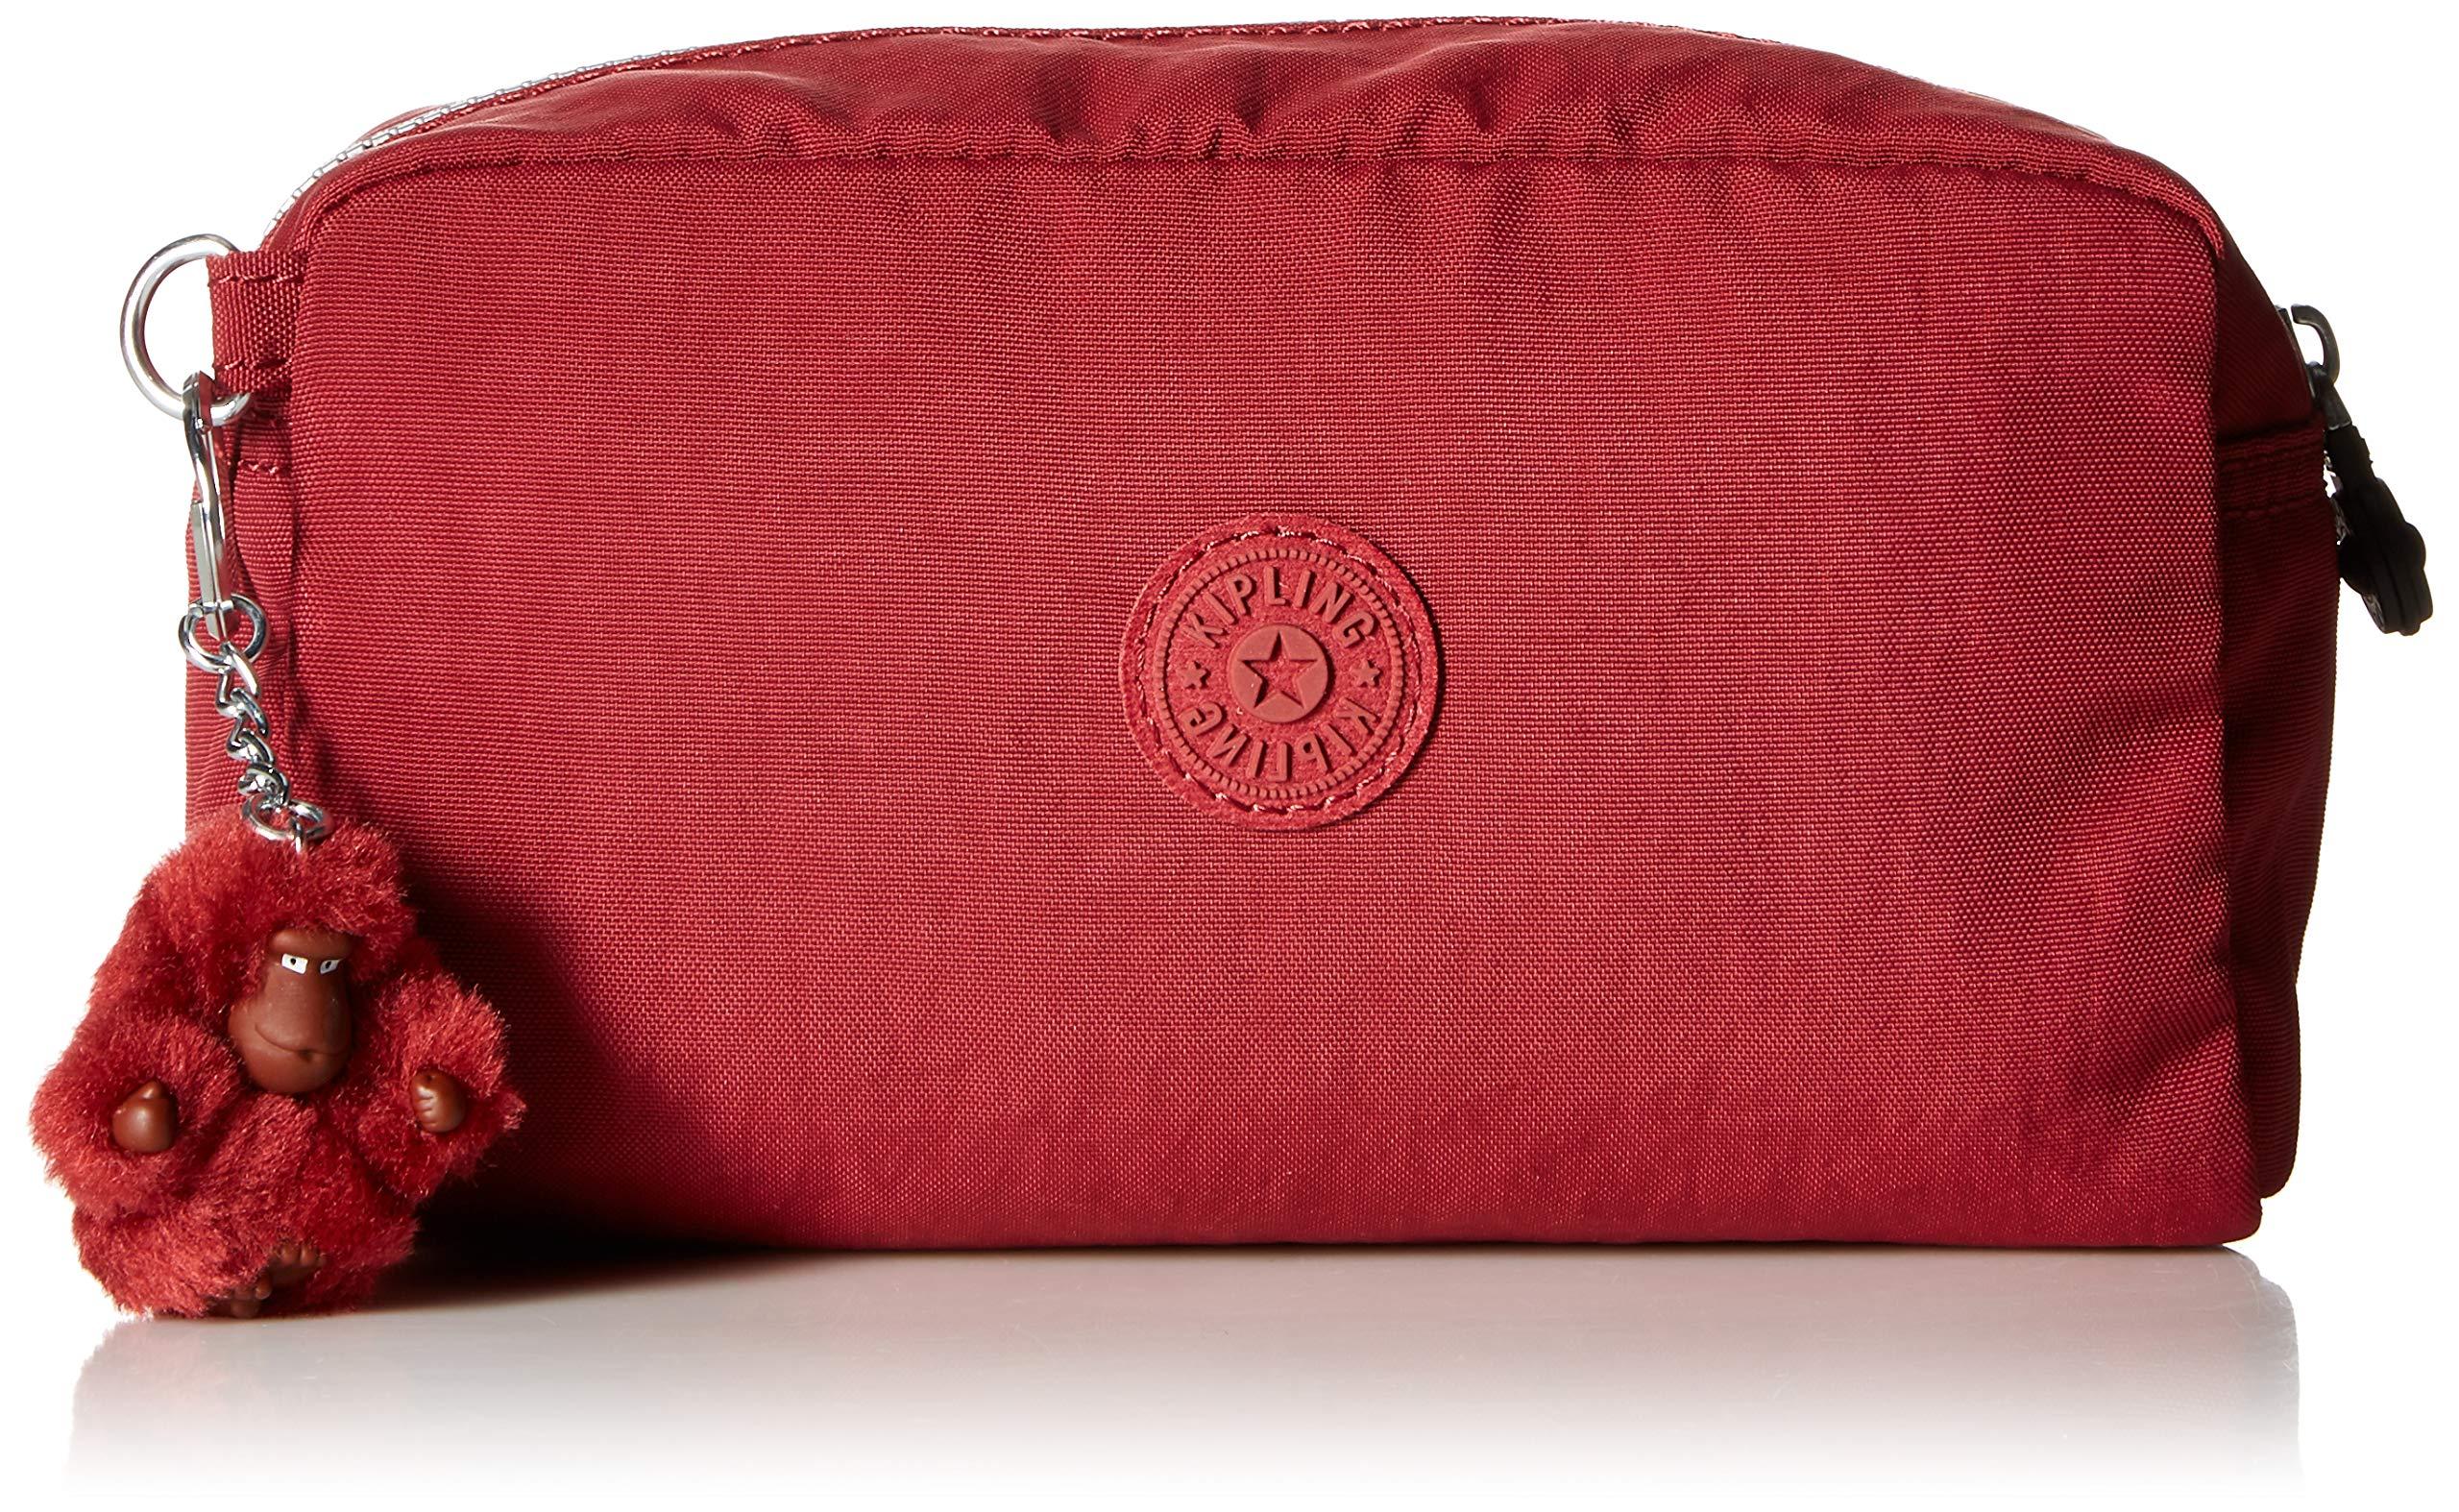 Kipling Gleam Multi Use Pouch, Zip Closure, Brick Red